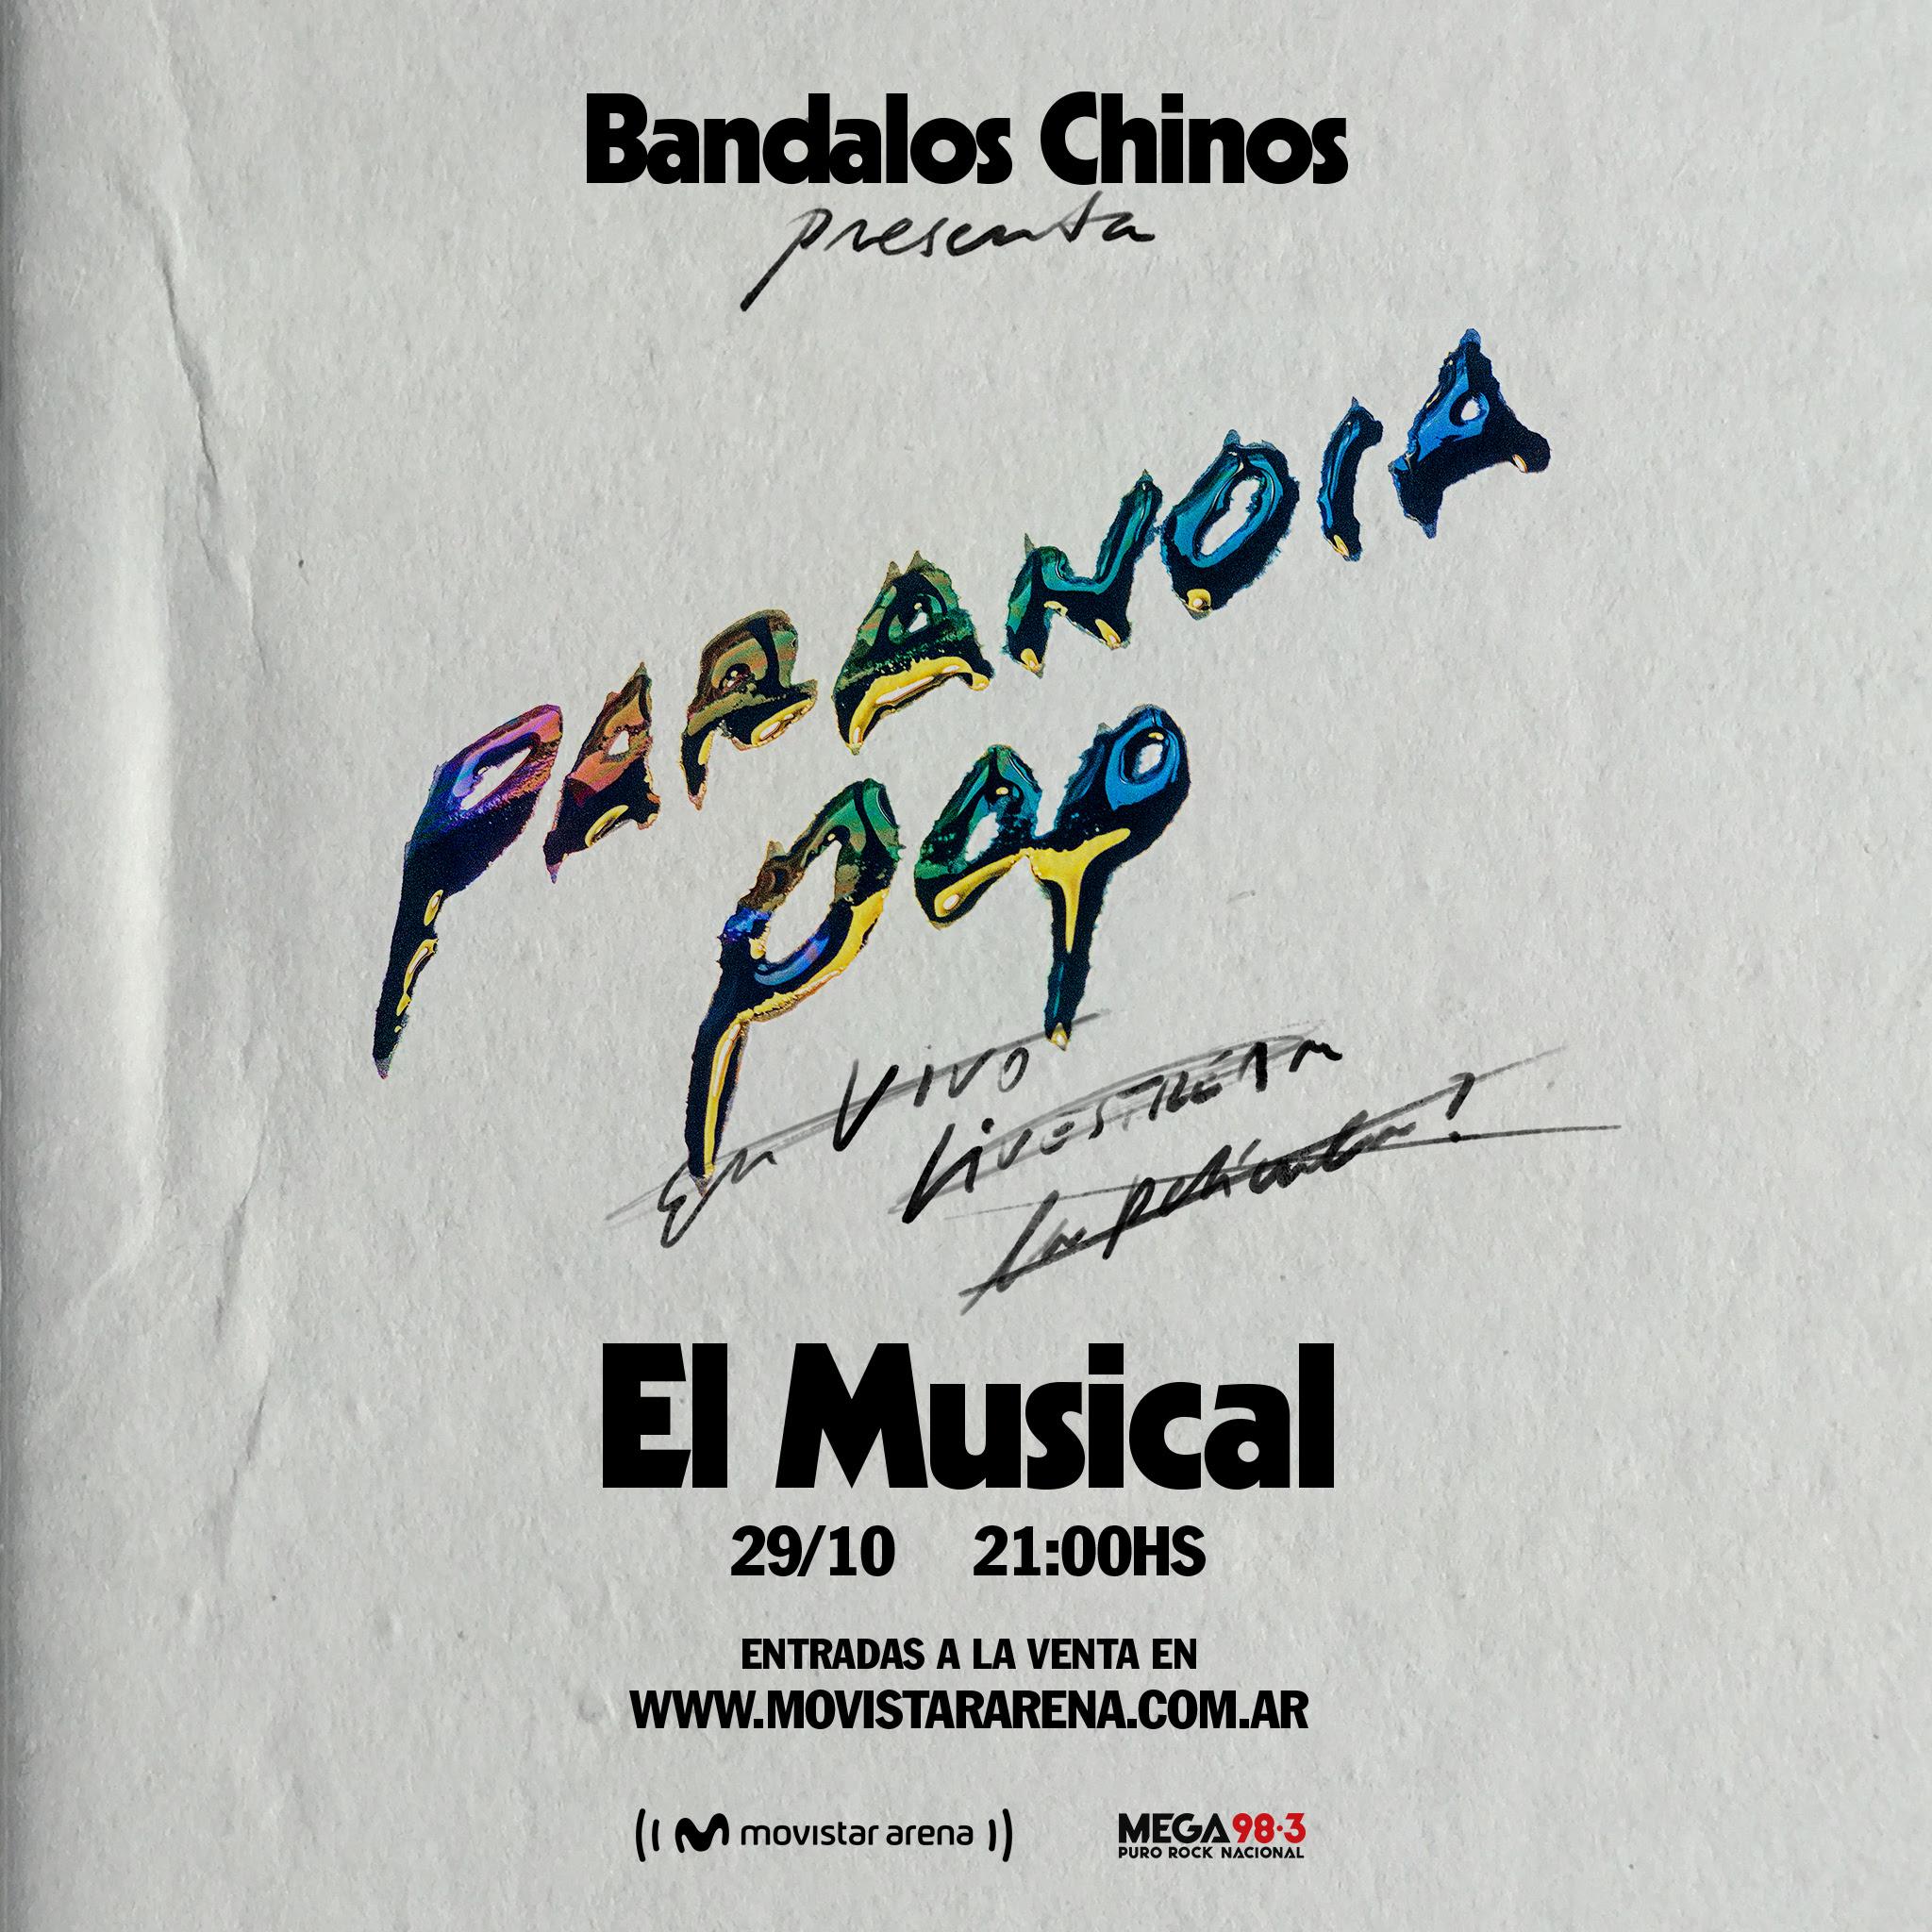 Bandalos Chinos en vivo vía streaming desde Movistar Arena (1)